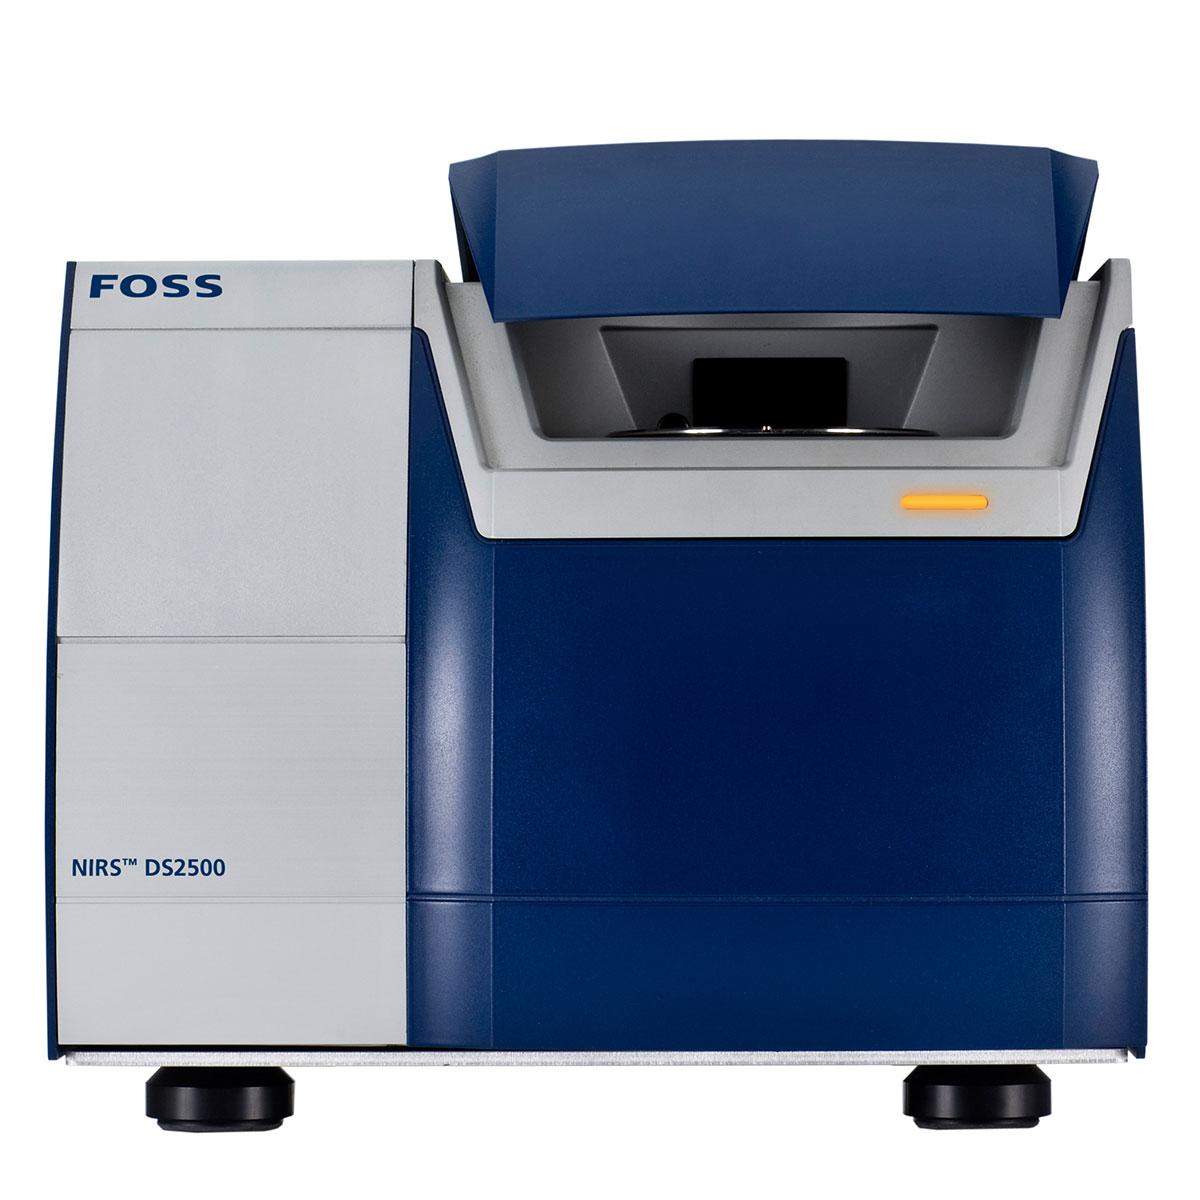 FOSS NIRS DS2500F   Yem Analiz Cihazı   Tekafos